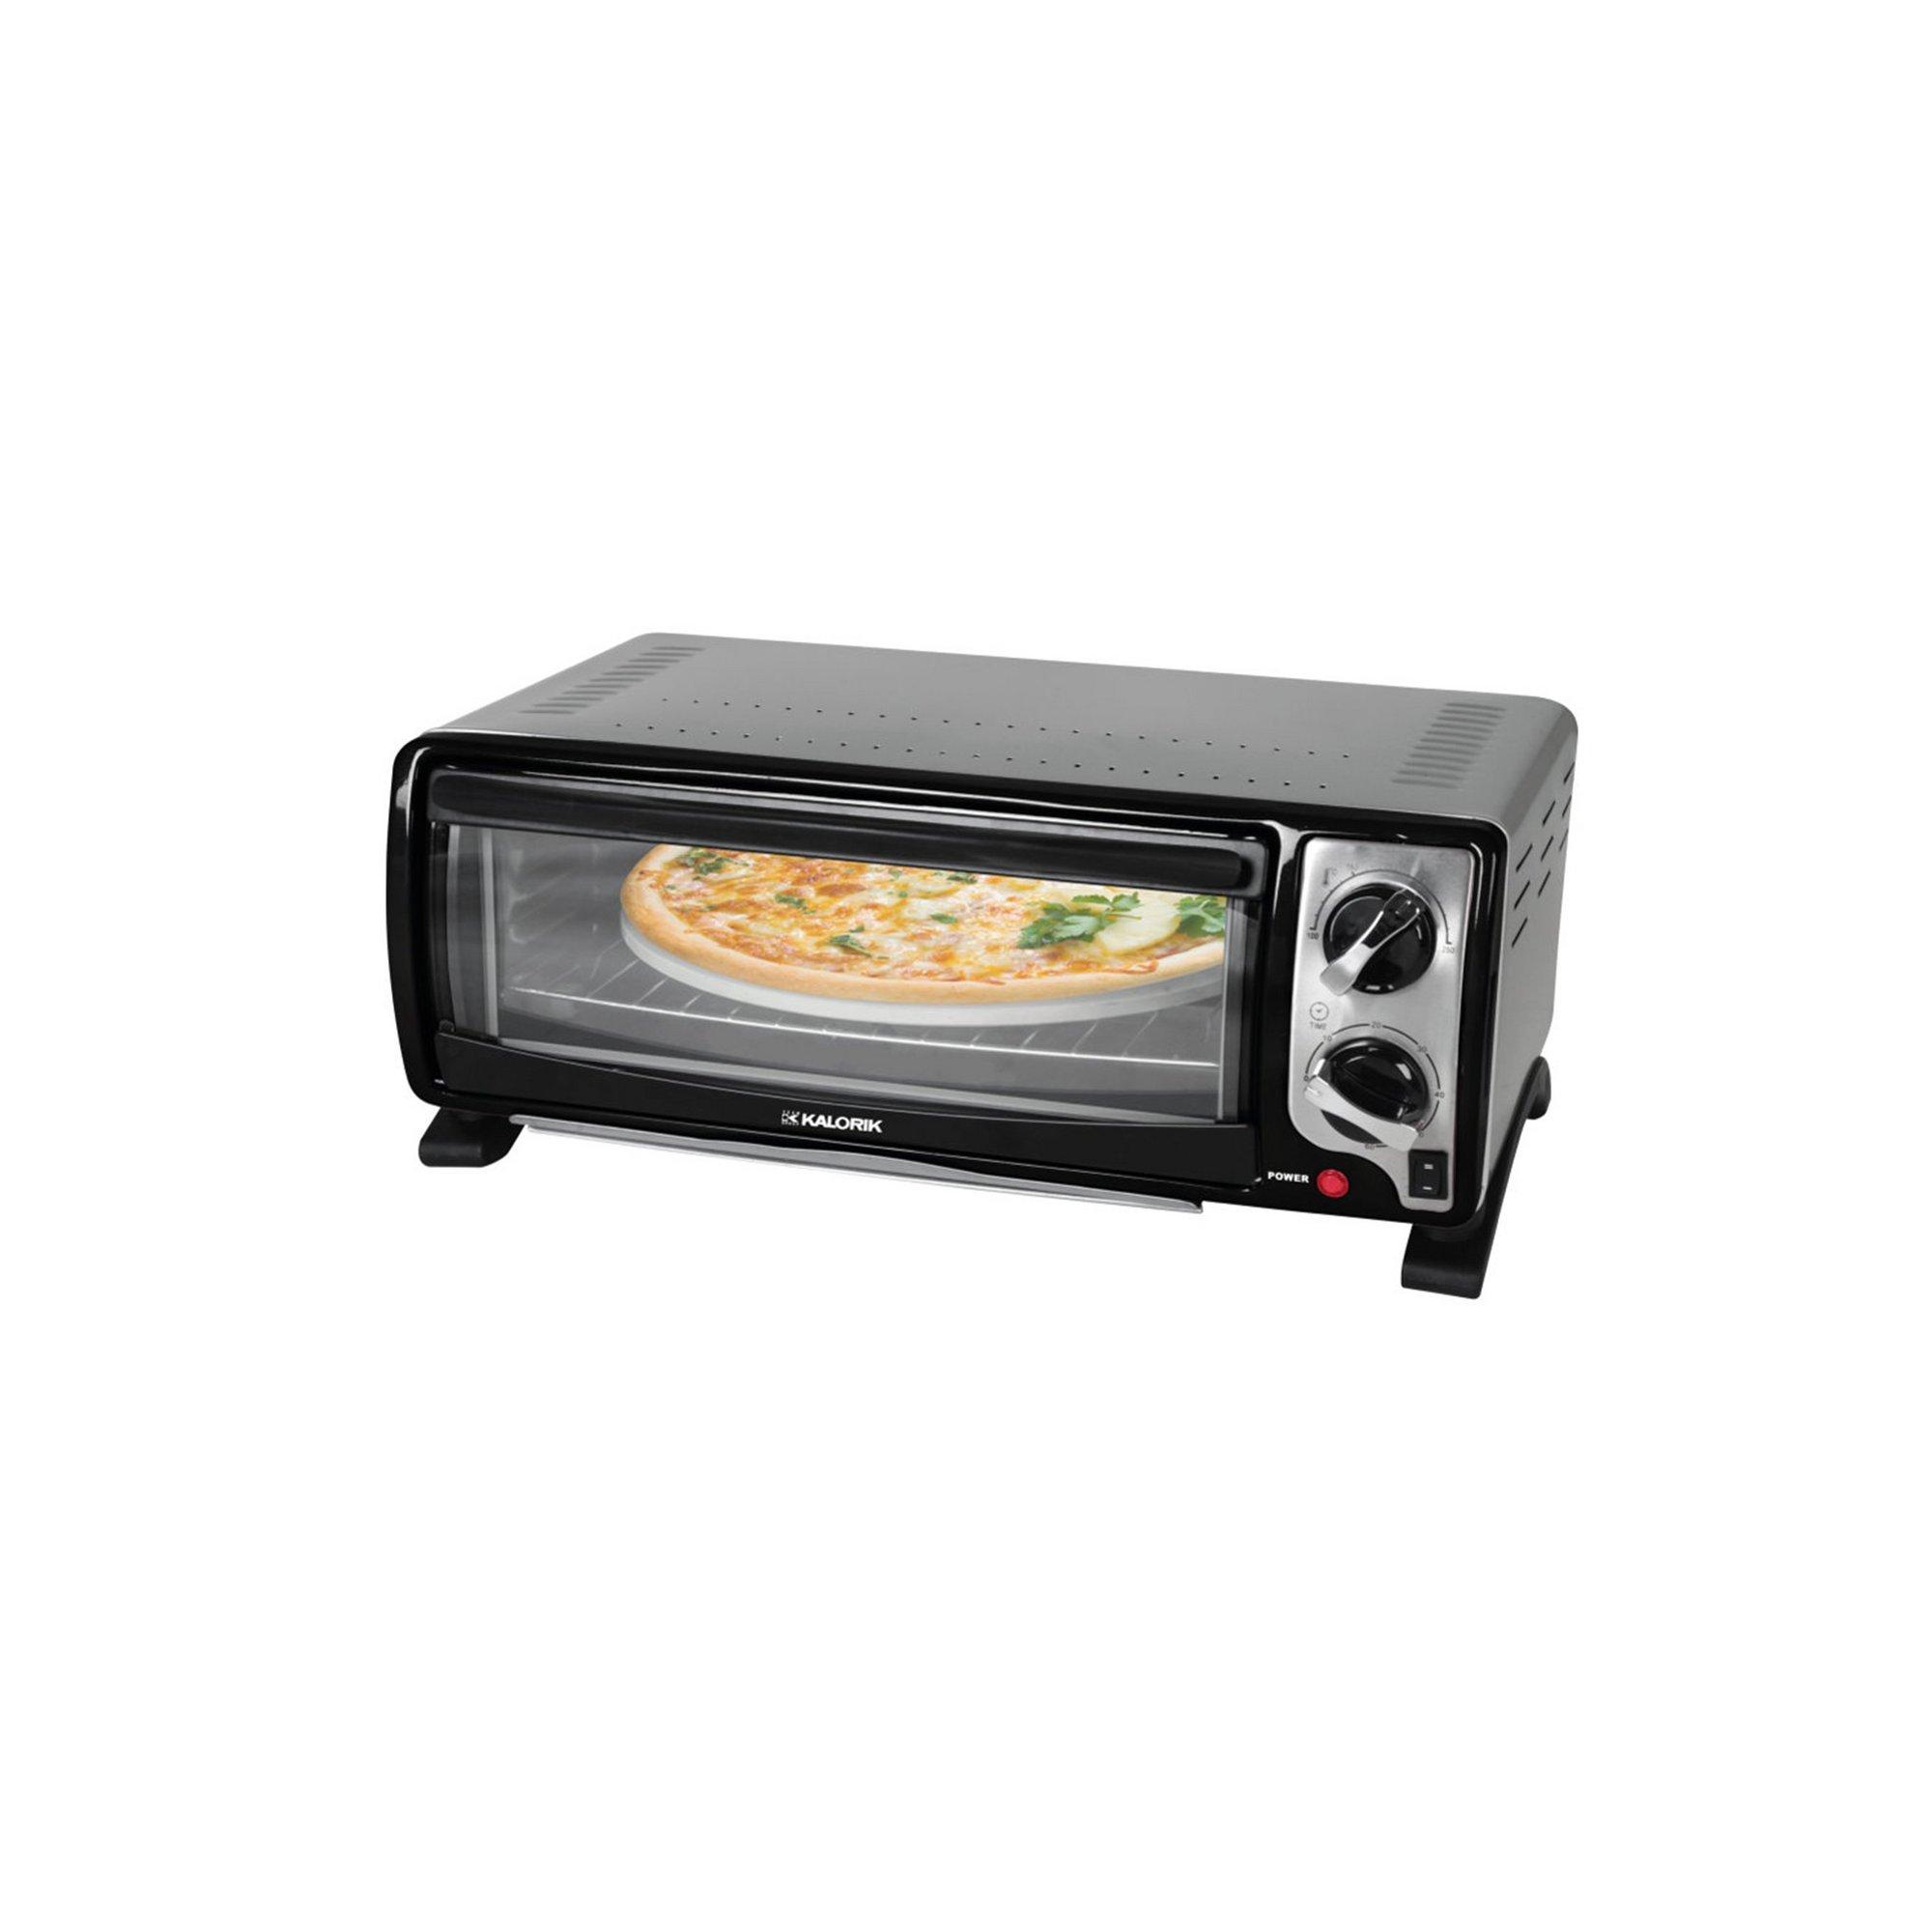 Image of Kalorik 13 Litre Electric Pizza Oven